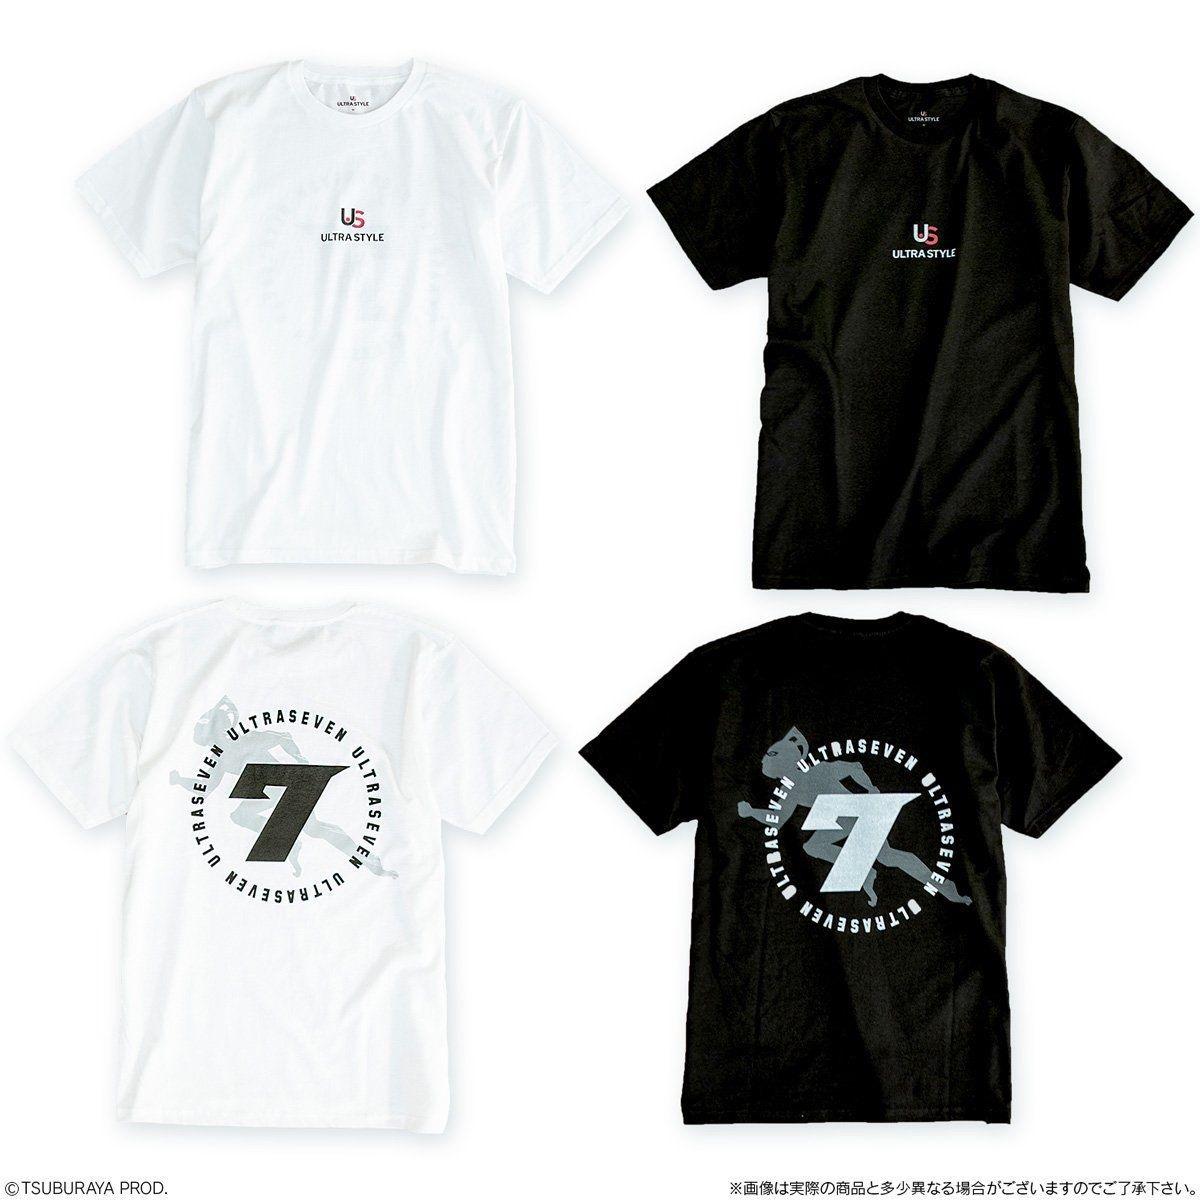 test ツイッターメディア - 【ULTRA STYLE 半袖Tシャツ メンズ】ウルトラマンタイガ/ウルトラマンゼロ/ウルトラマンジード【プレミアムバンダイ予約:3月30日 11時~】https://t.co/7rJKxqchI6【画】 #ウルトラマン https://t.co/bS6JsowMRX